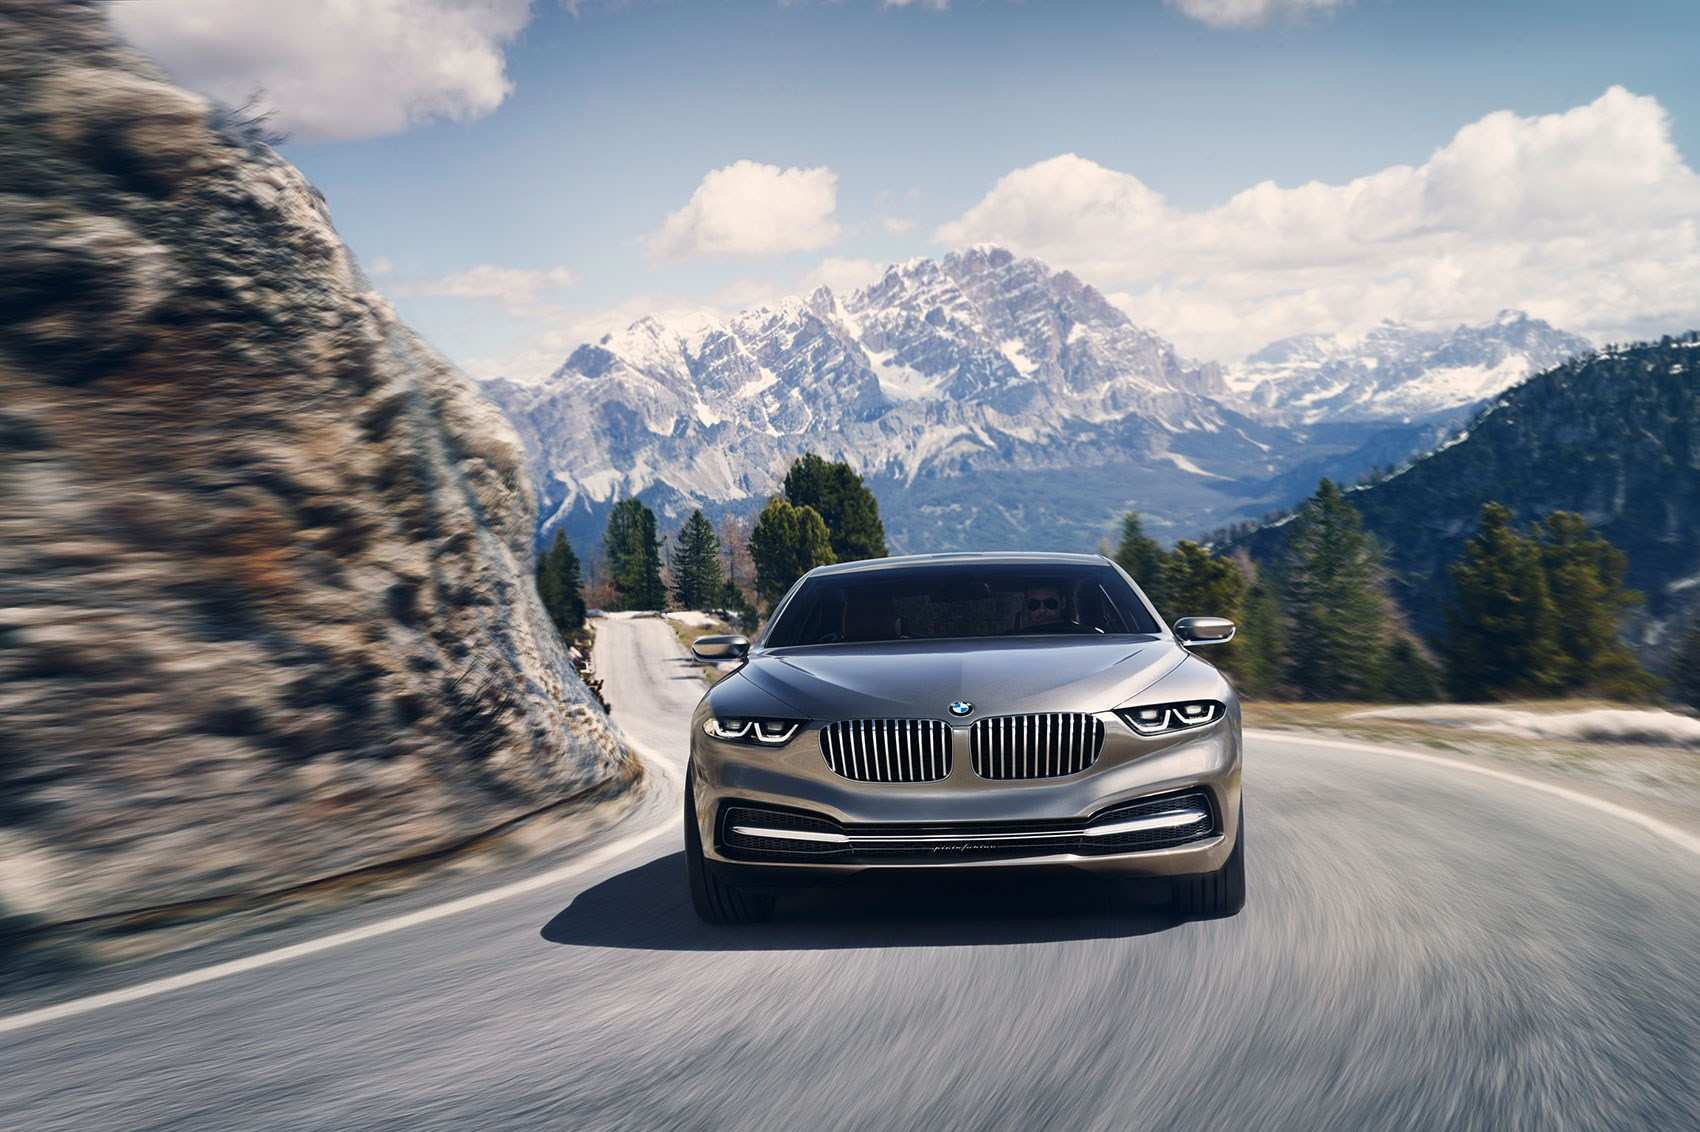 93 Concept of 2020 Bmw 9 Serisi Price with 2020 Bmw 9 Serisi